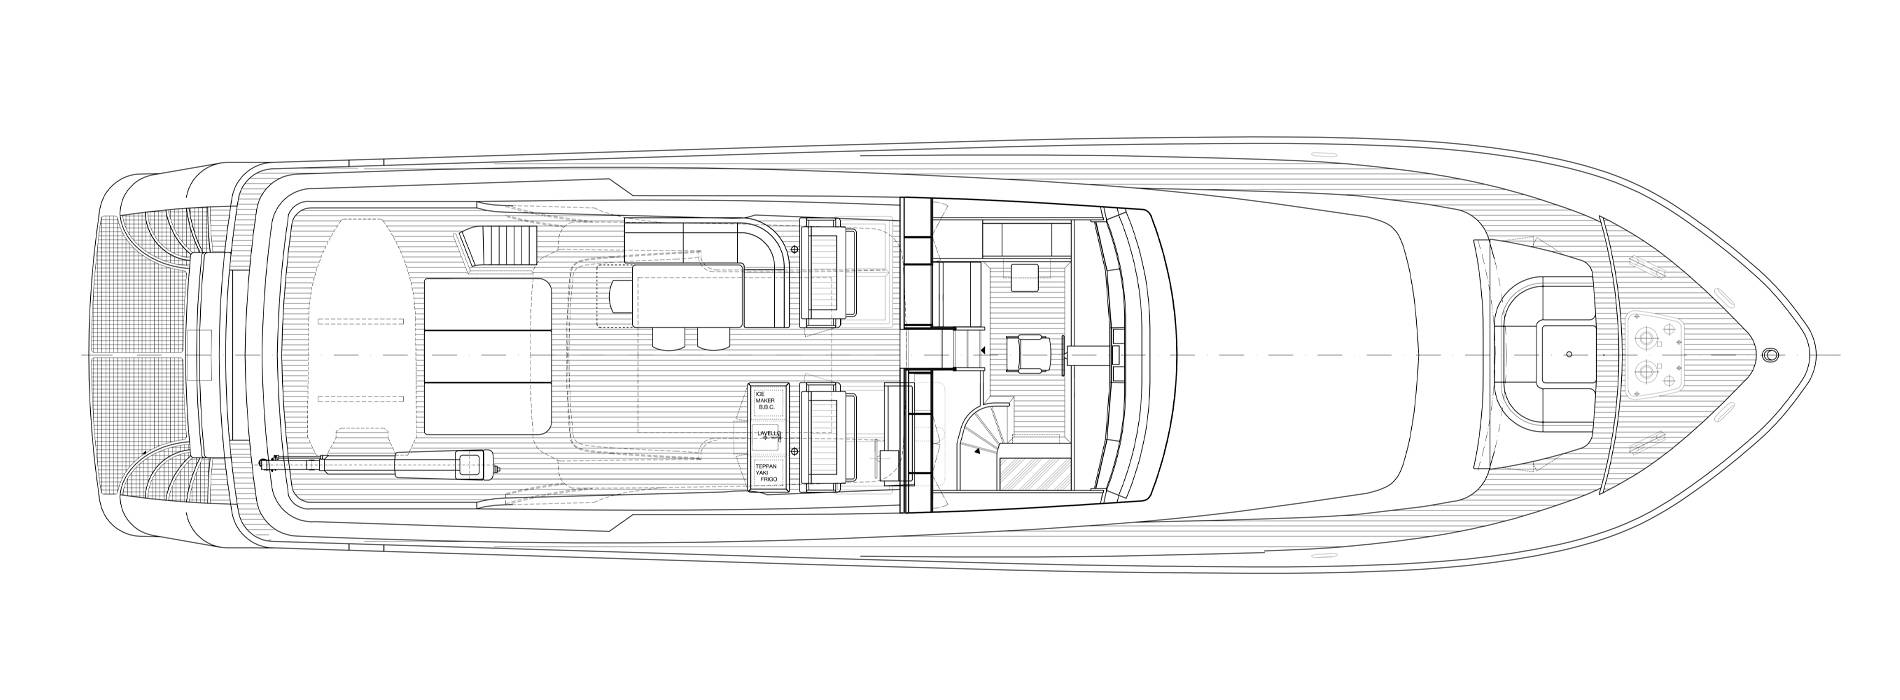 Sanlorenzo Yachts SL88-541 飞桥